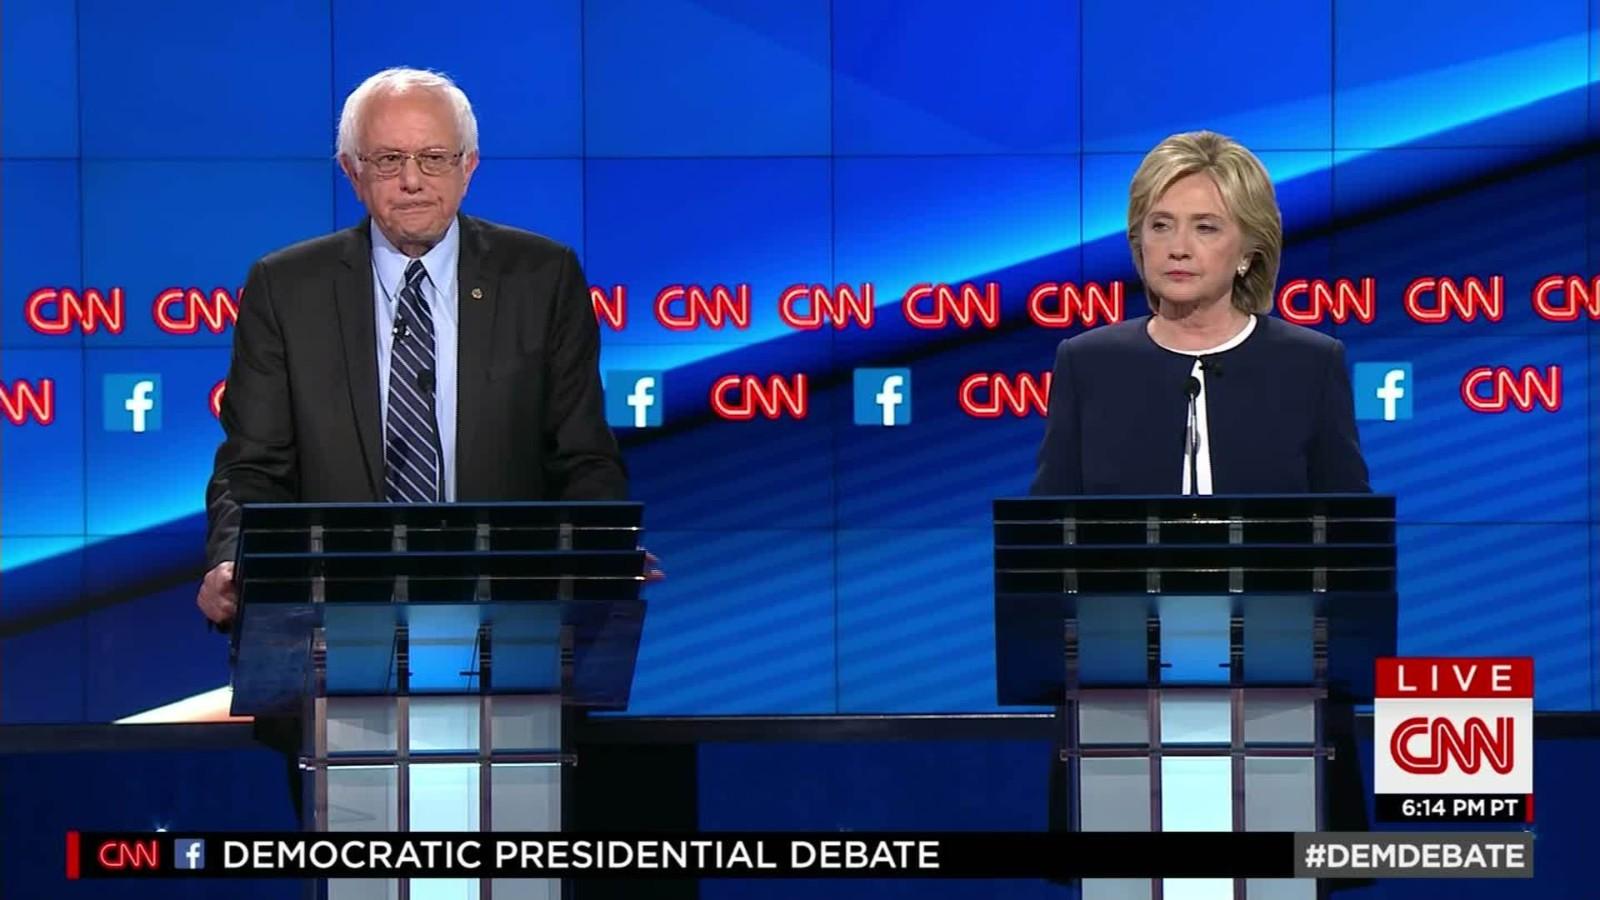 Sanders Vs Clinton: It's Coming Down To California